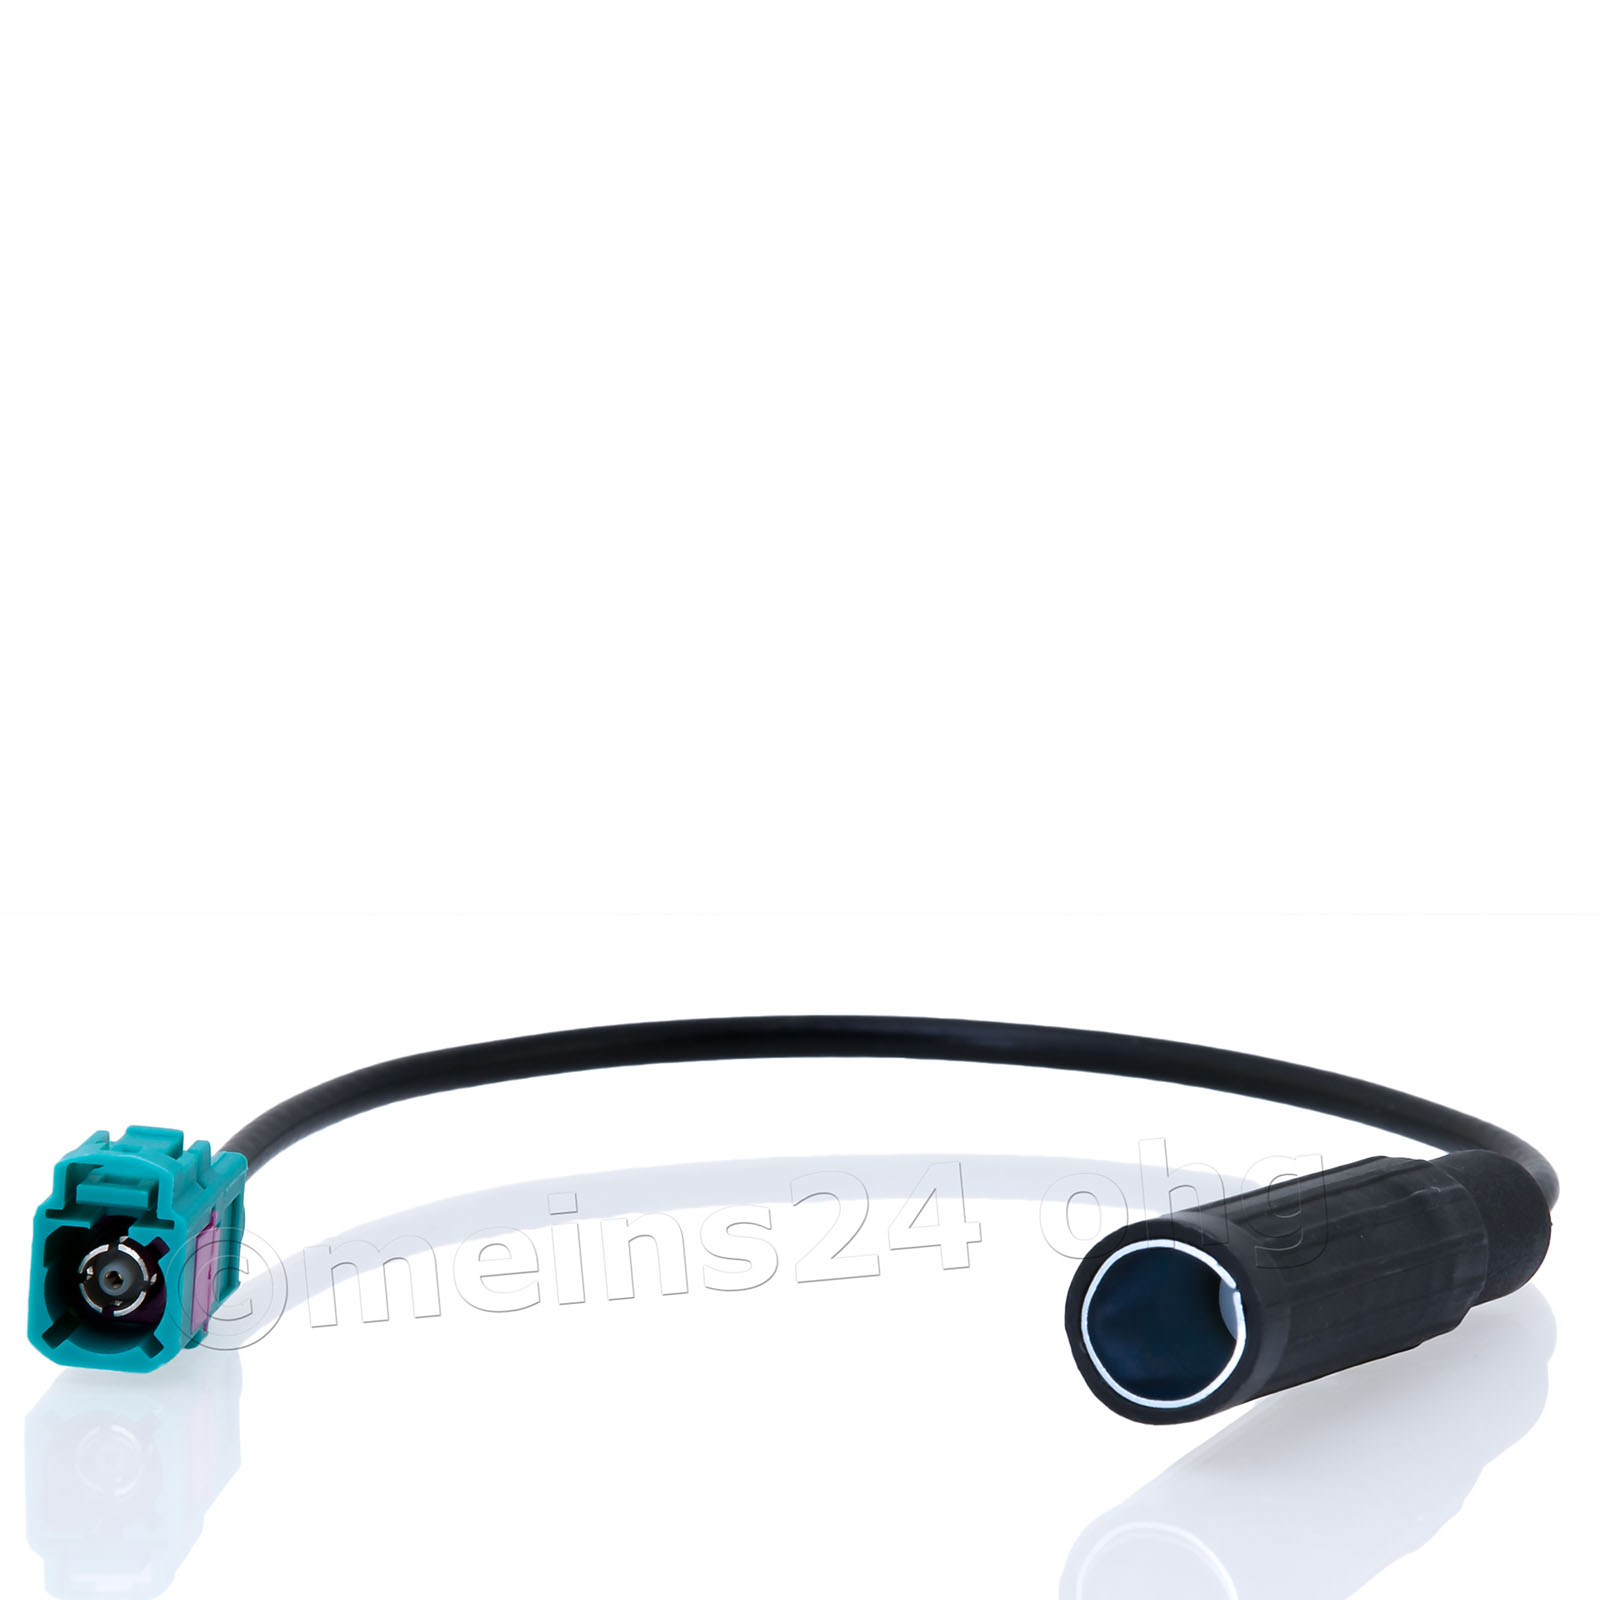 ACV 1521-01 DIN Fakra Antennenadapter f/ür Audi//BMW//VW